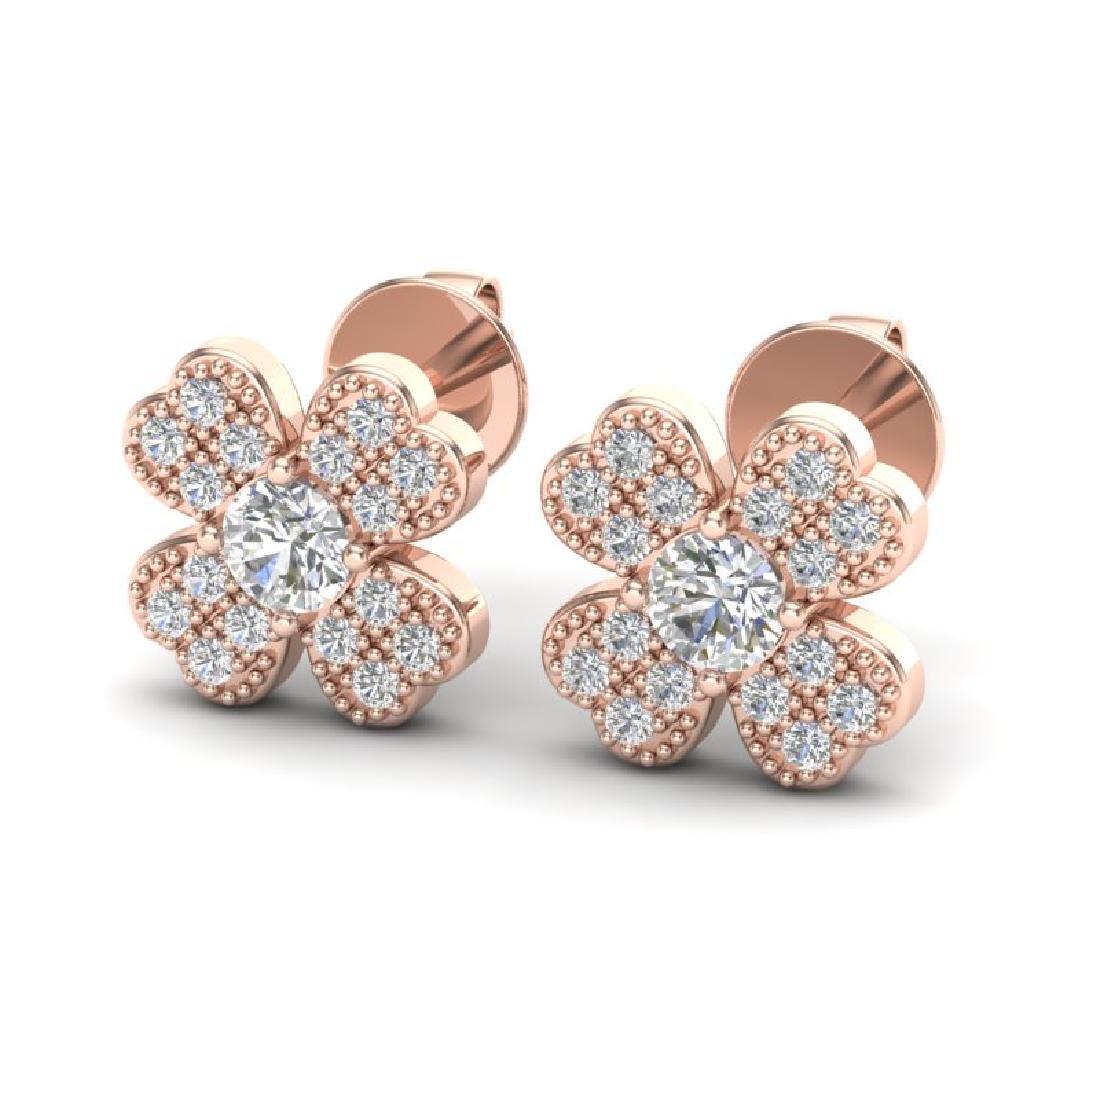 0.54 CTW Micro Pave VS/SI Diamond Earrings 14K Rose